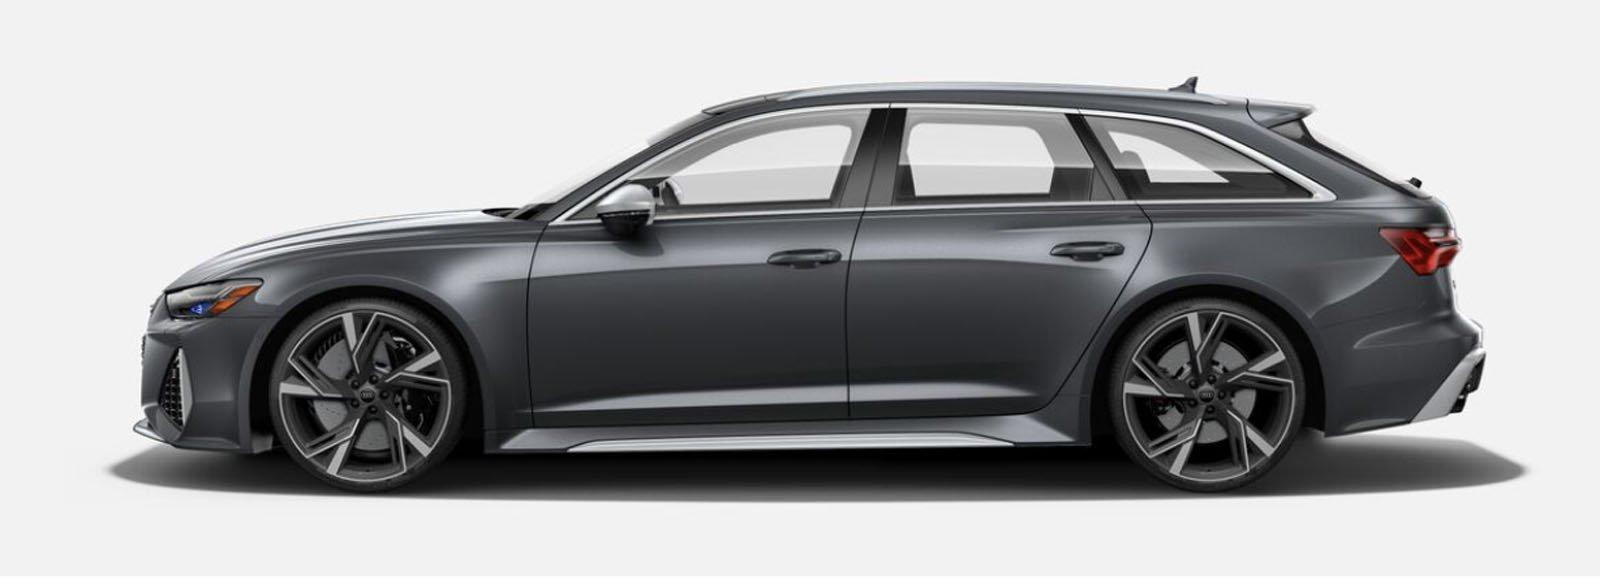 2021 Audi RS 6 Avant Daytona Gray